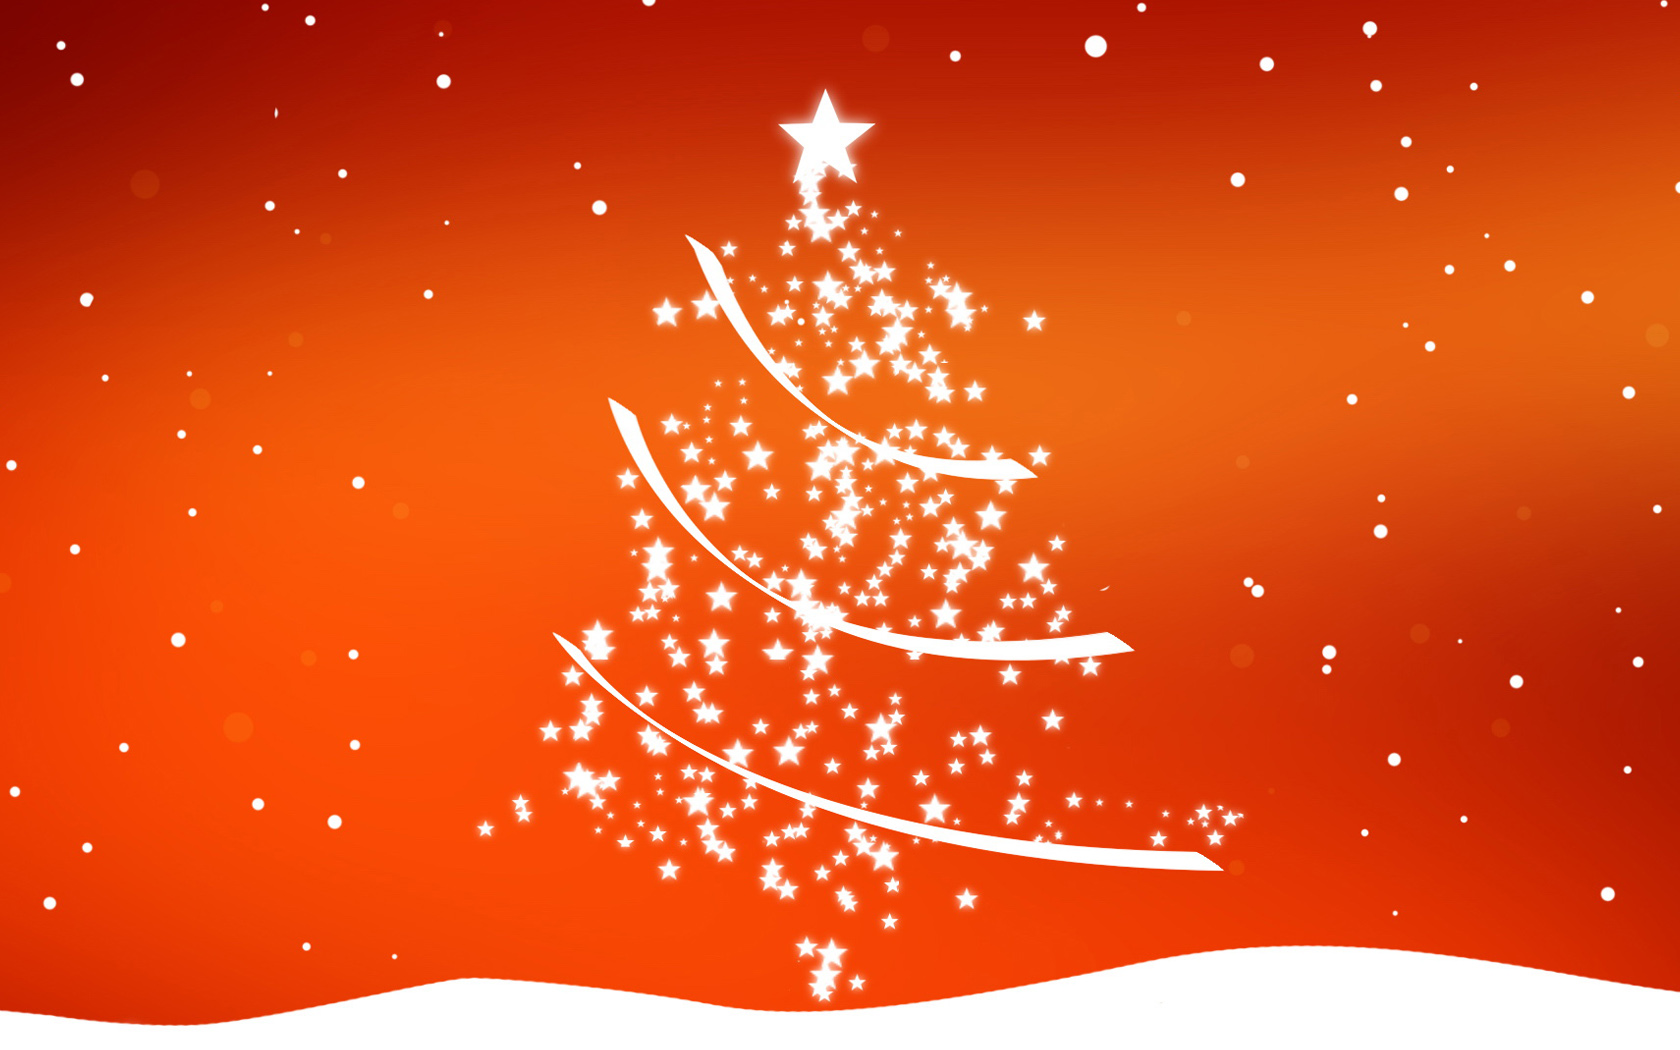 Google themes christmas - Christmas Theme Wallpaper Download_high Definition Wallpapers